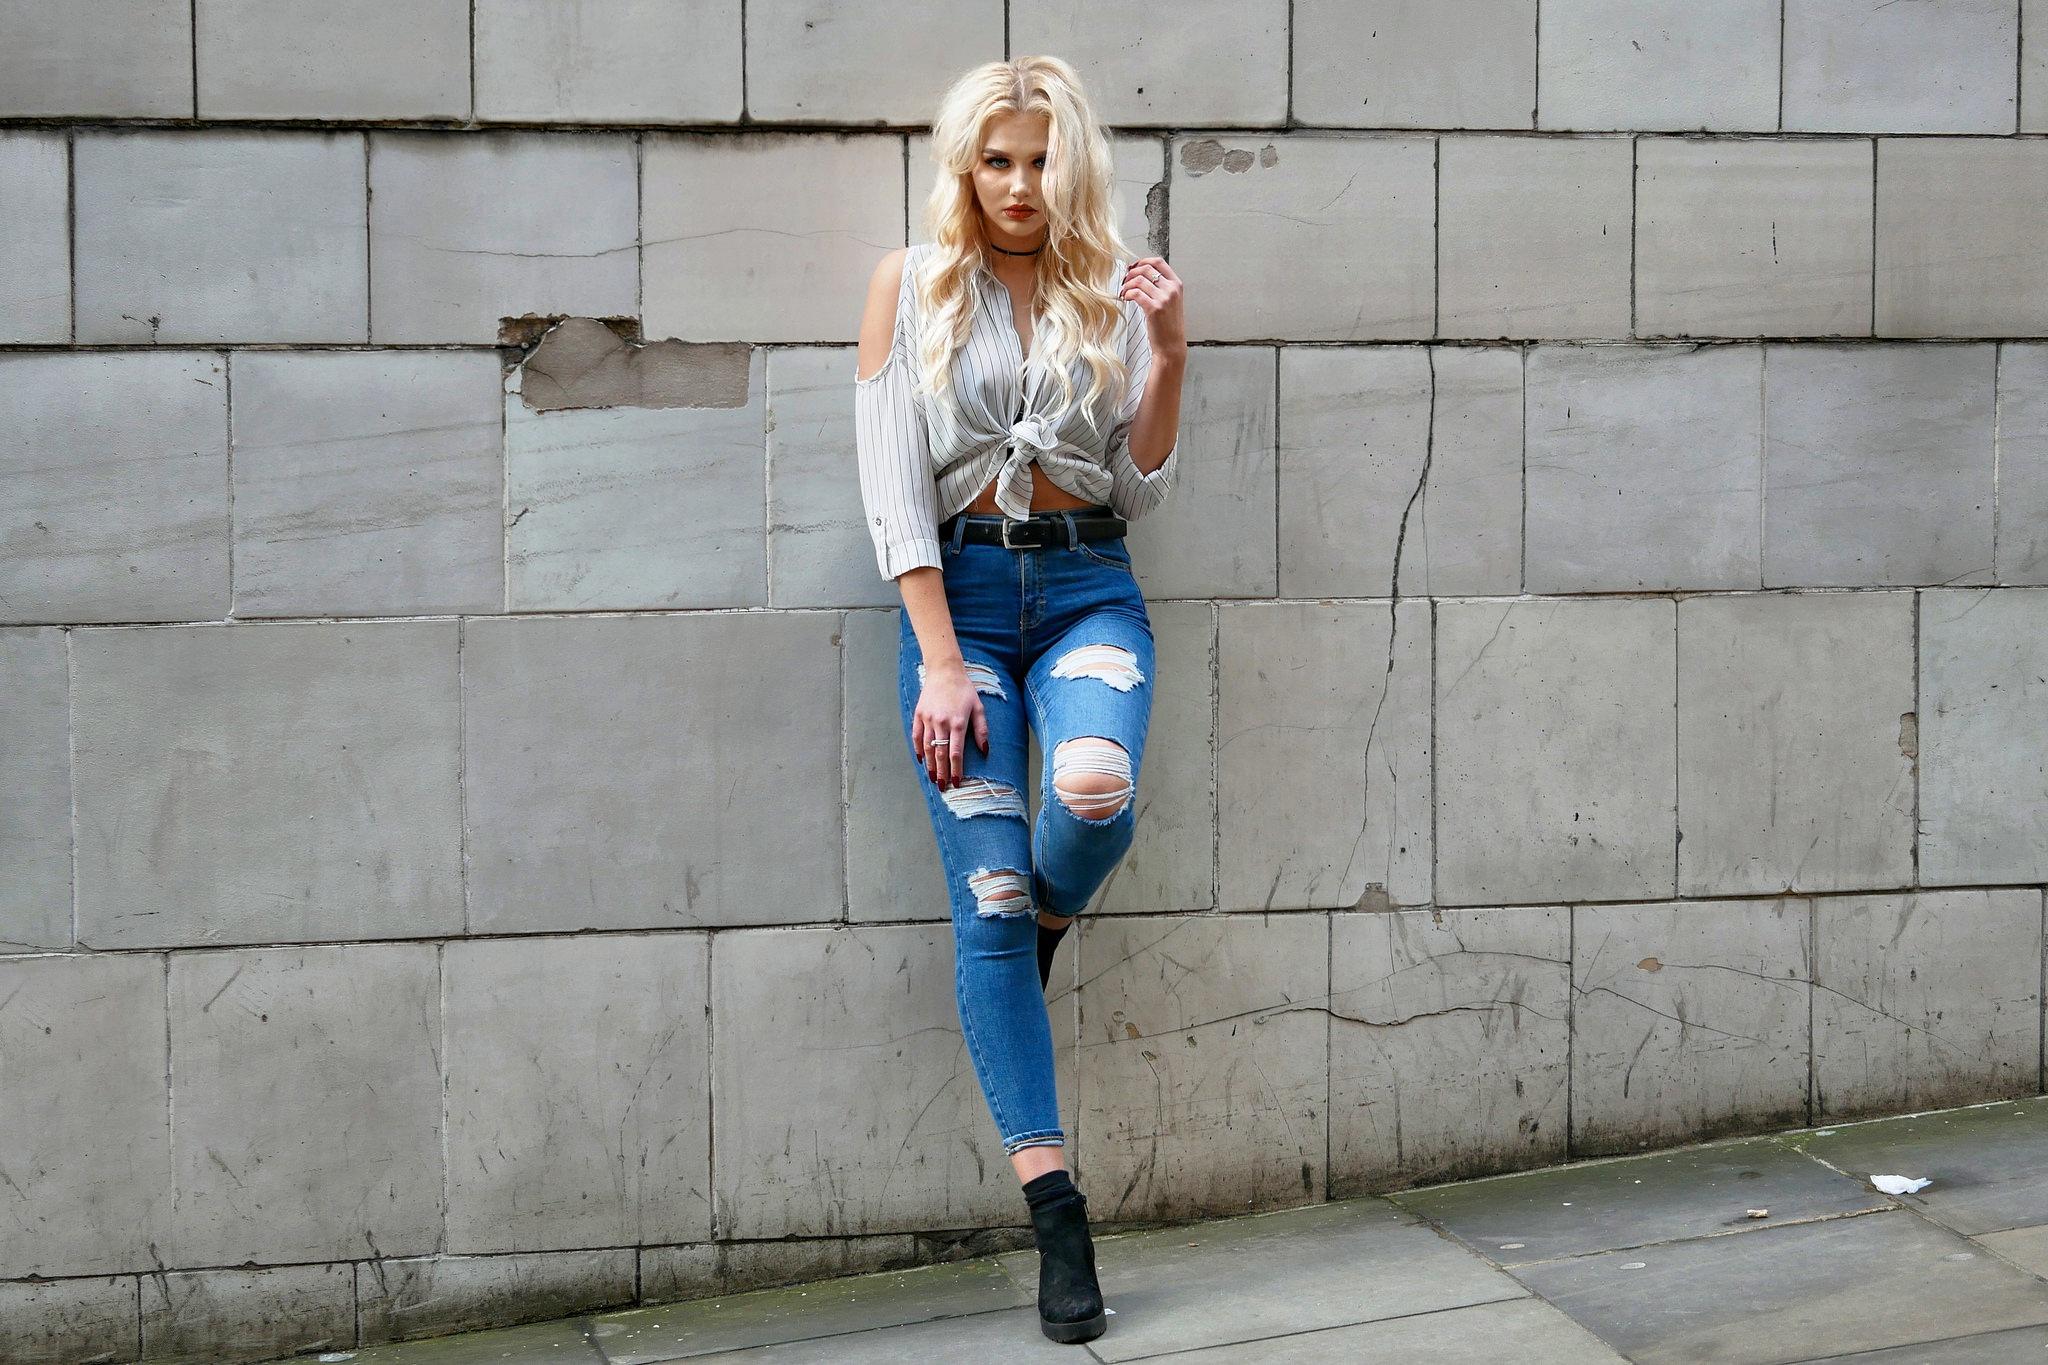 блондинки с каре в джинсах фото бали много